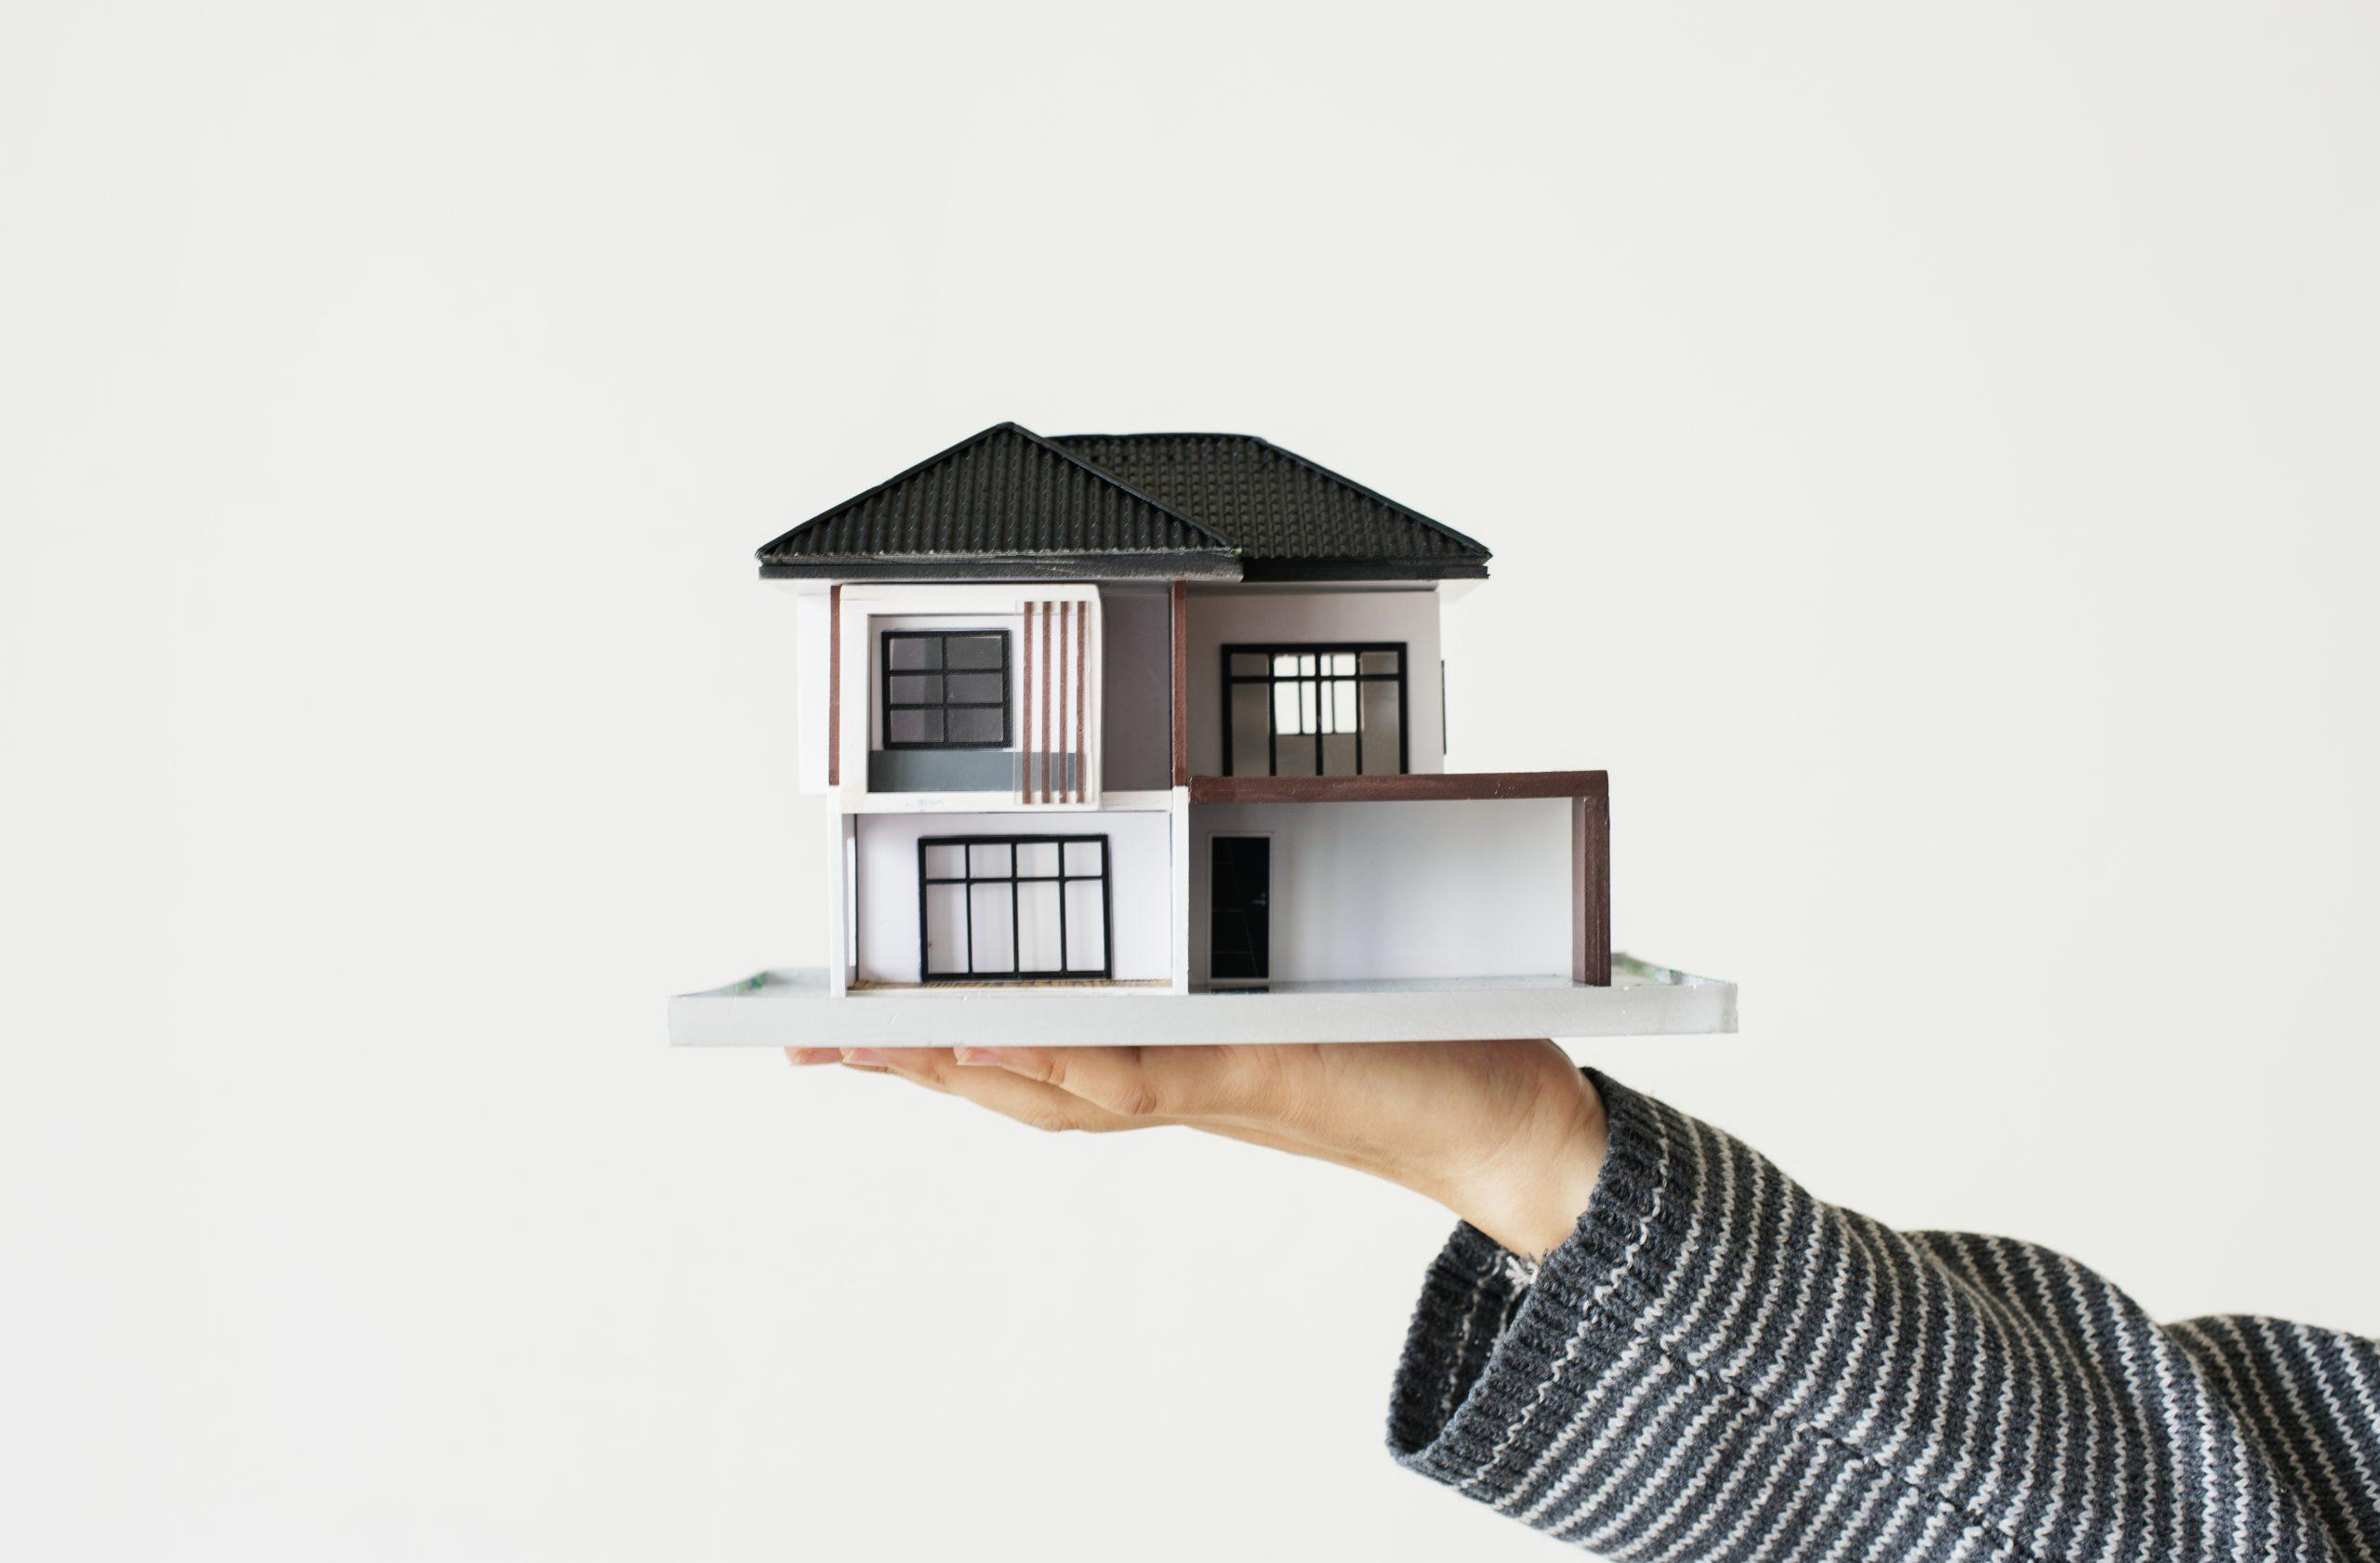 Housing Market for April 2021